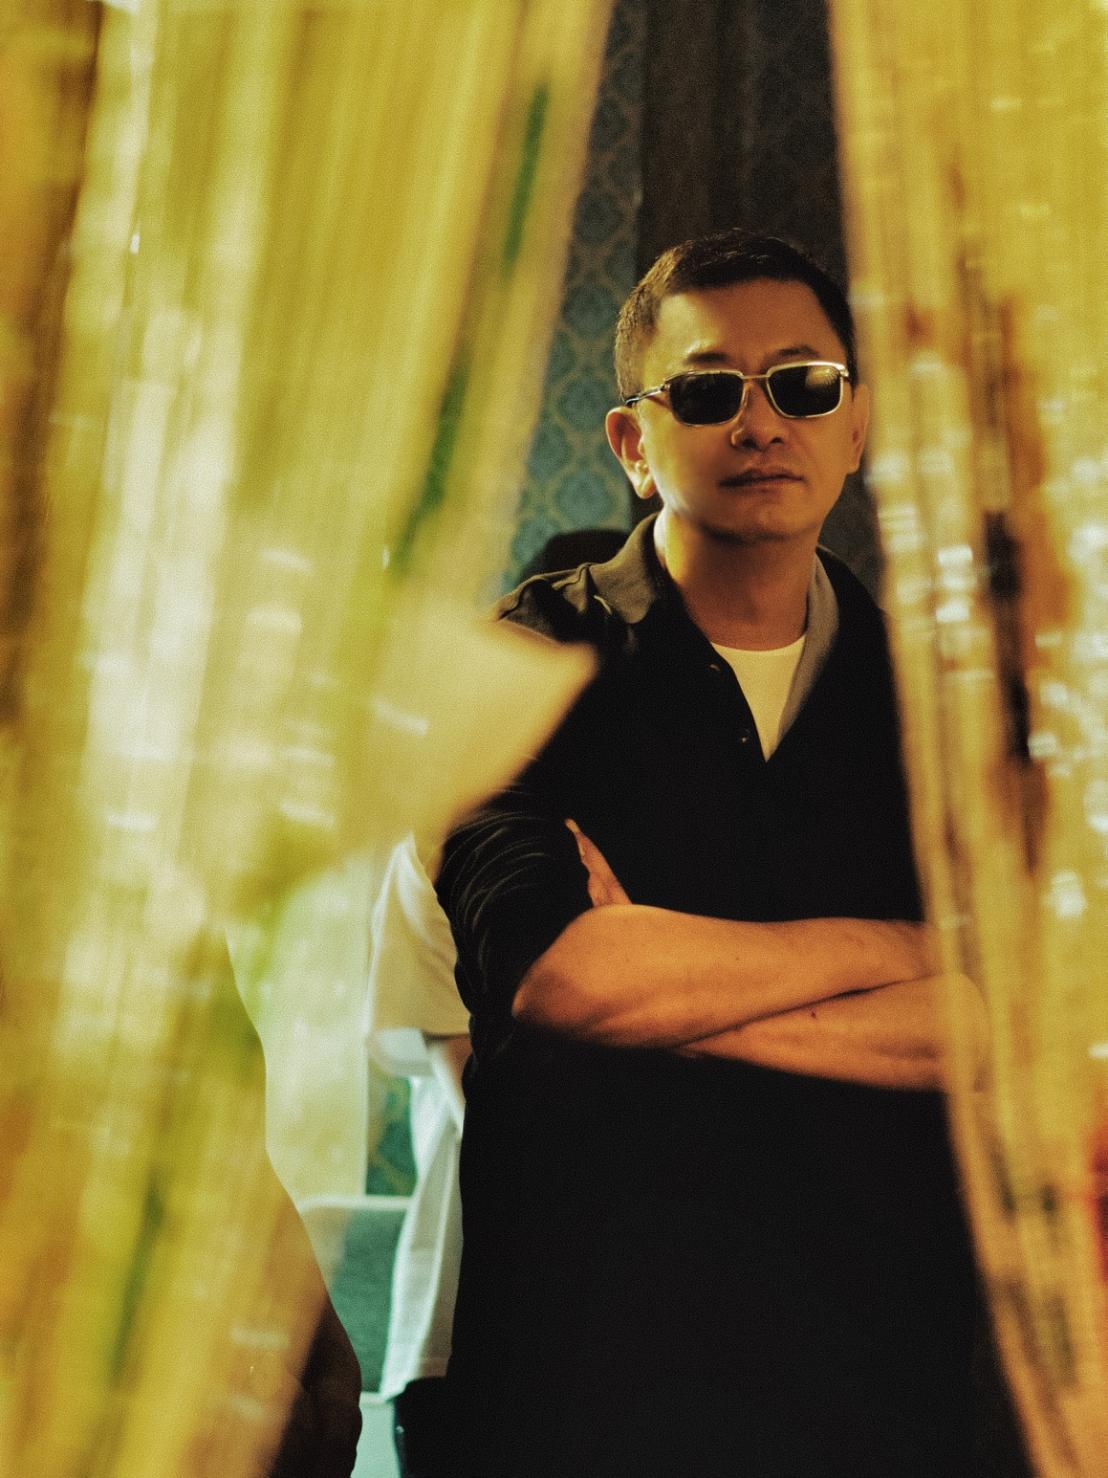 Wong Kar Wai's Portrait - ©️Jettone Films 澤東電影 2